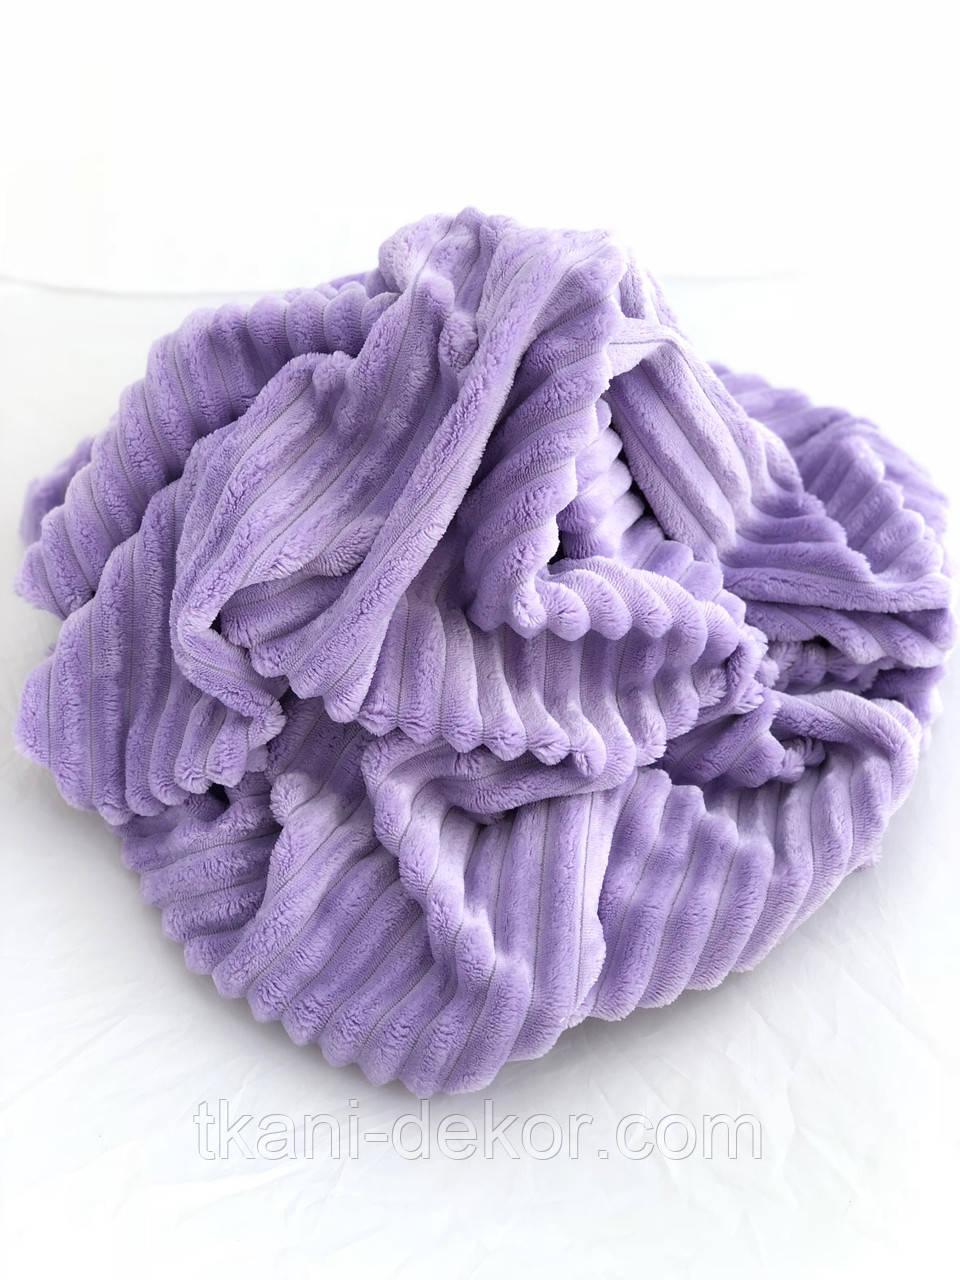 Ткань плюшевая Minky Stripes сиреневый (шарпей)